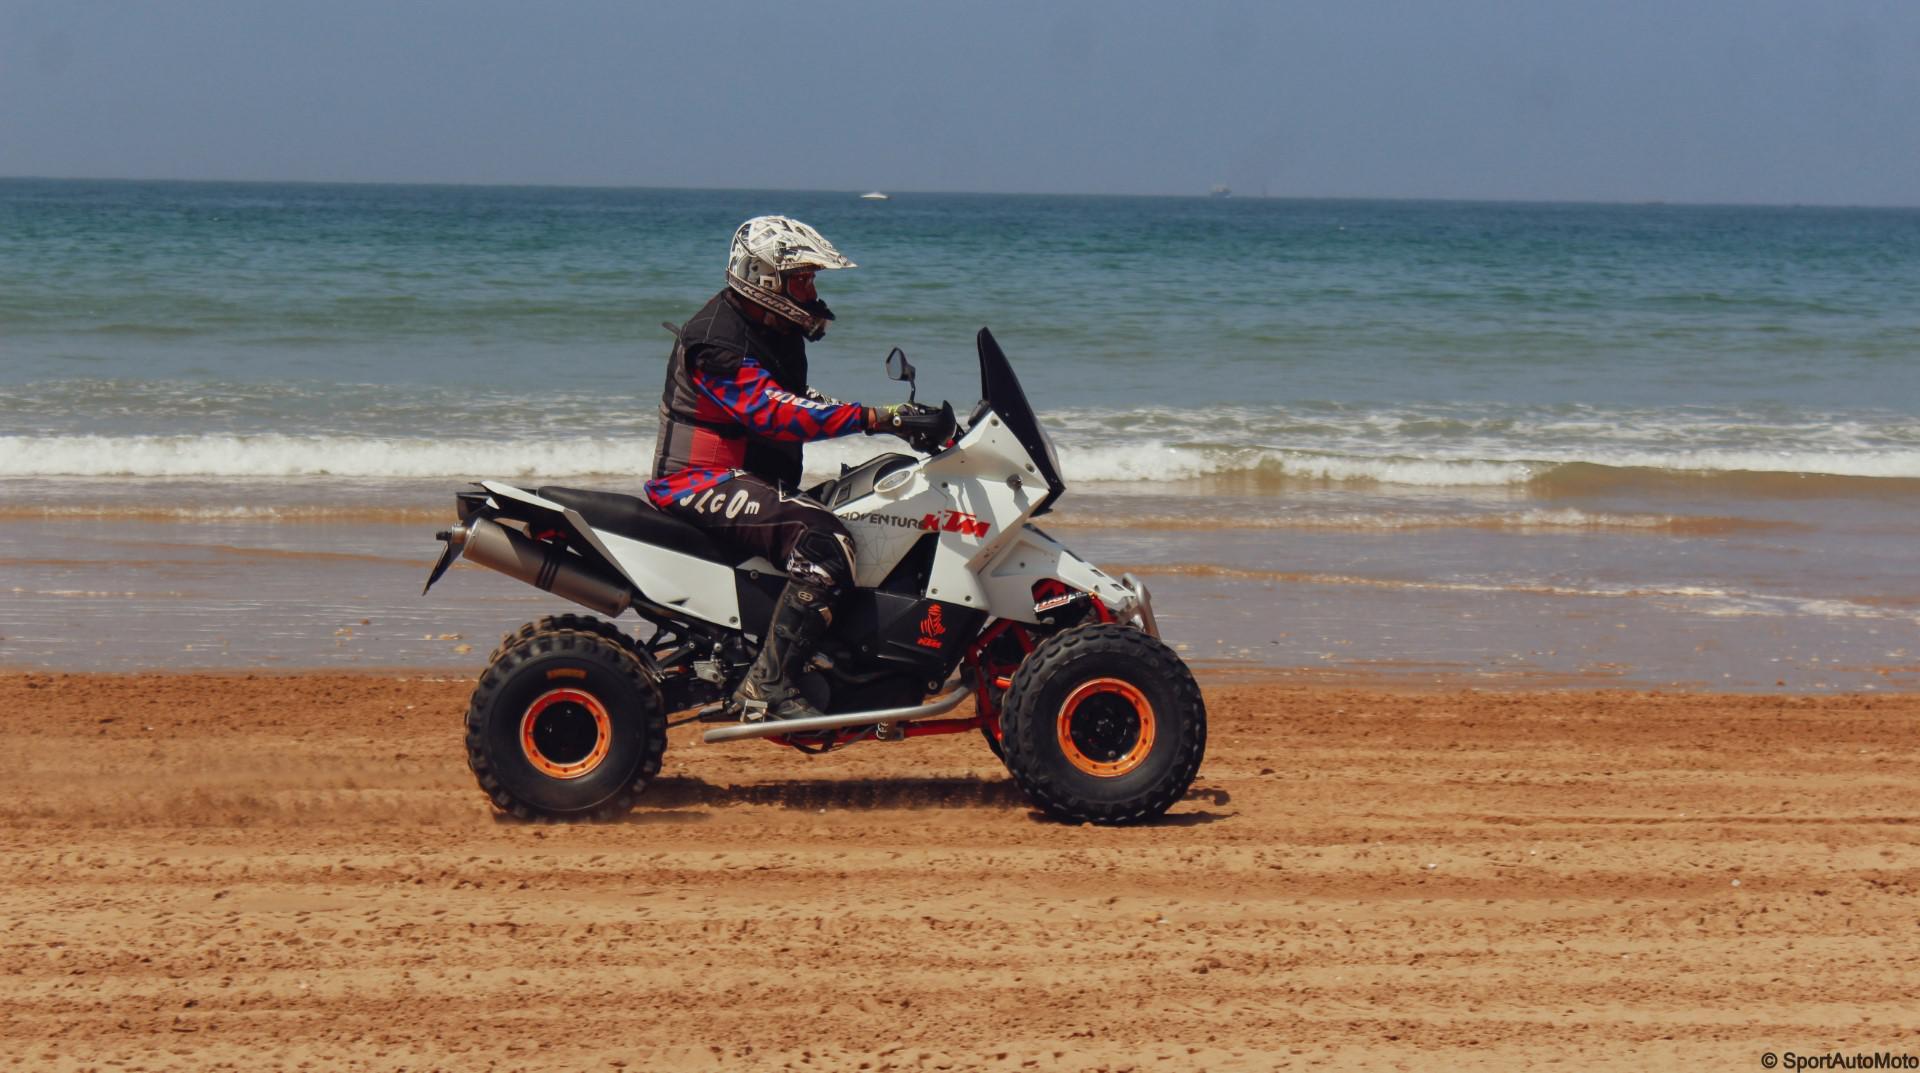 agadir-beach-race-la-reussite-791-28.jpg